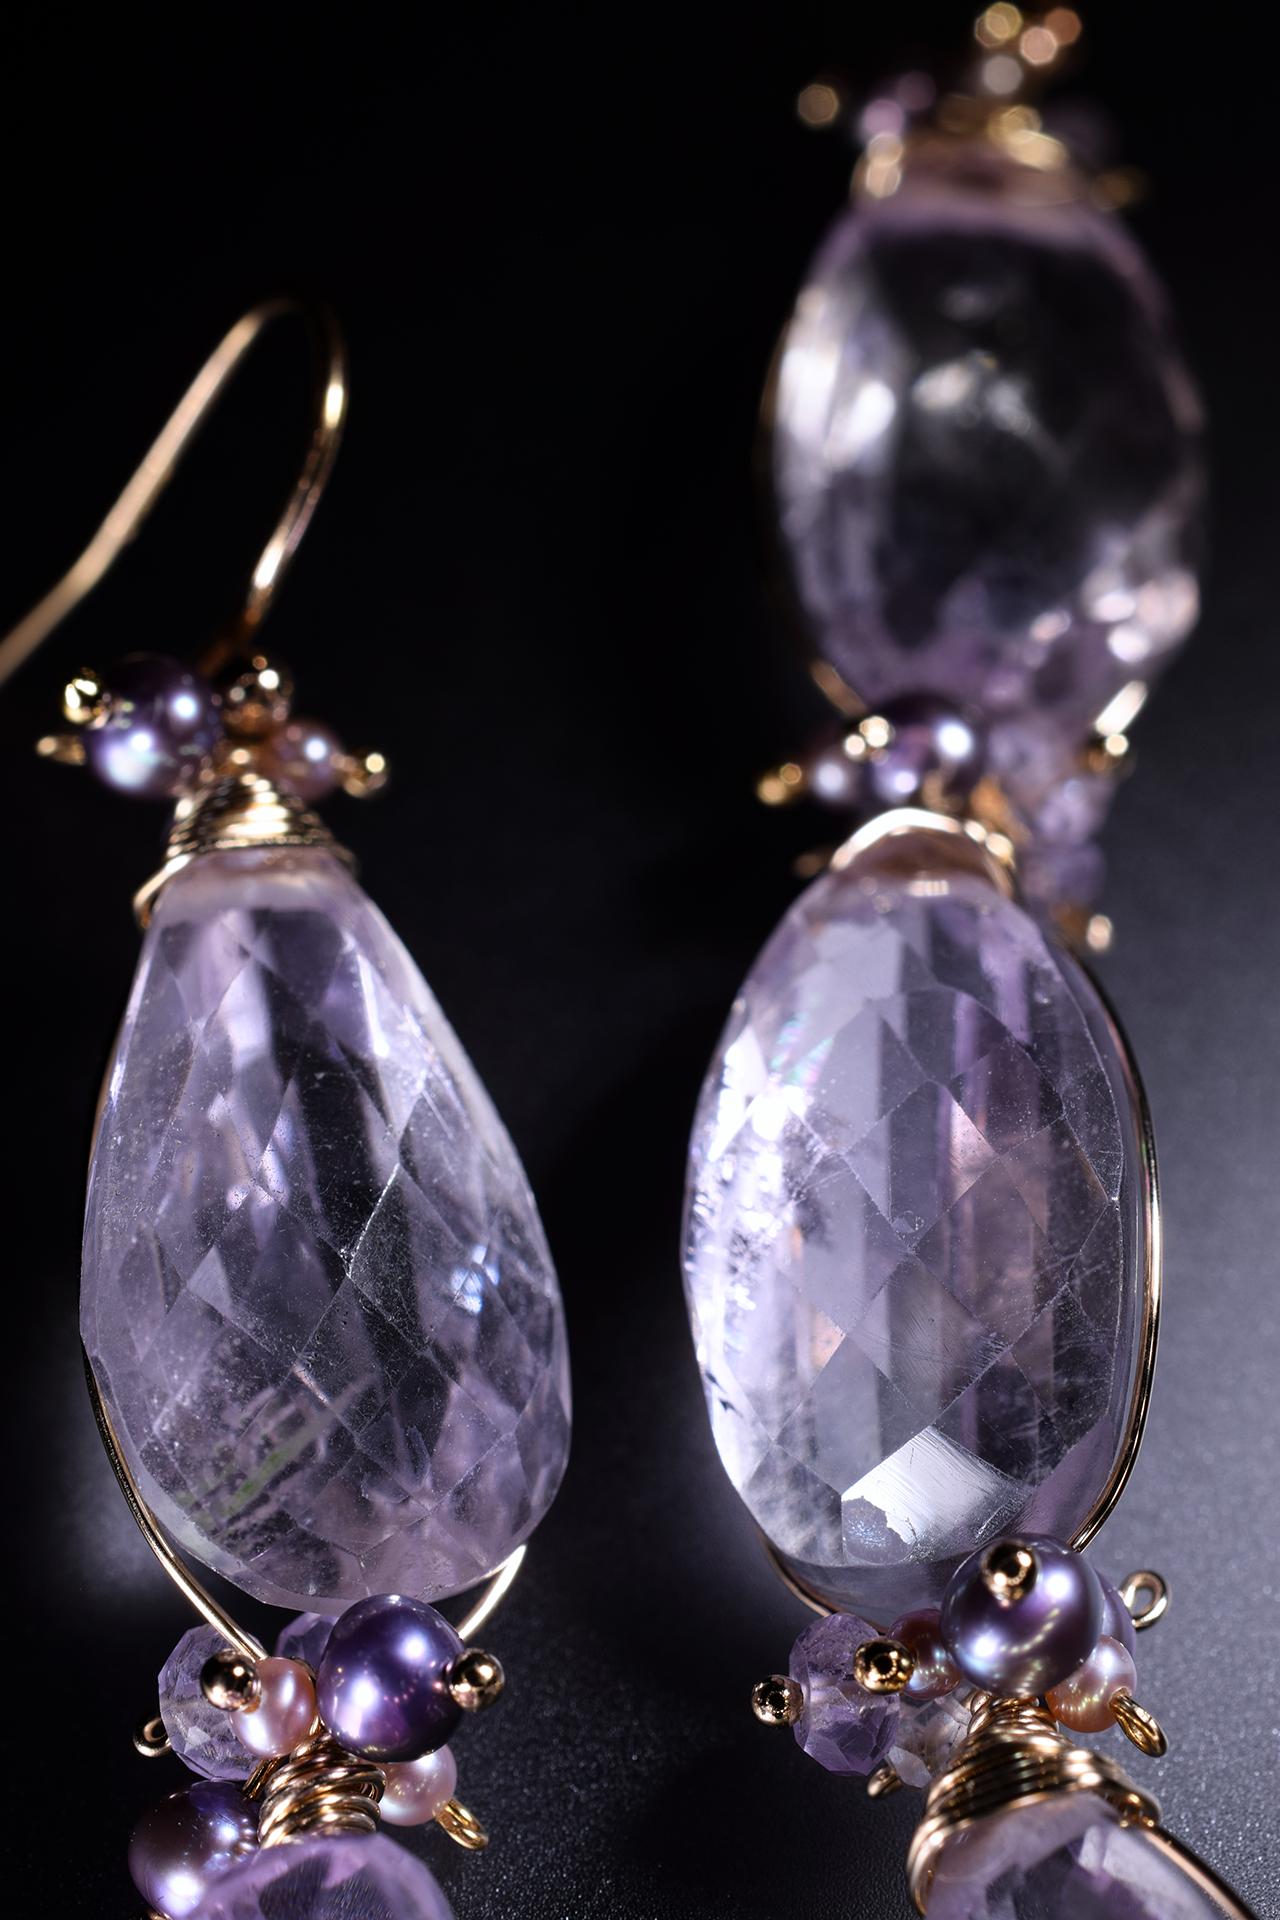 Details of pink amethyst and pearl drop earrings